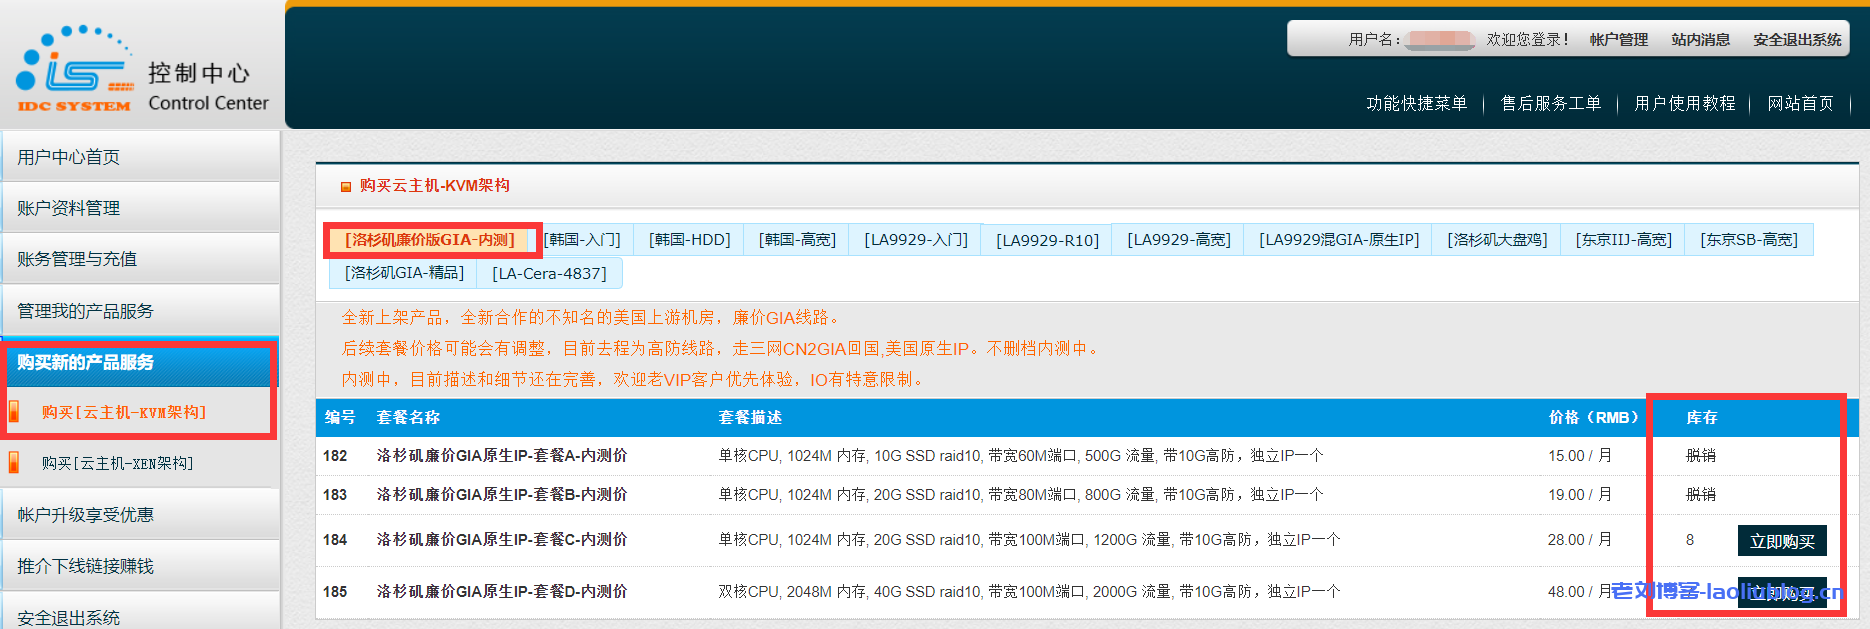 HostYun新上美国三网GIA特价套餐{洛杉矶廉价版GIA-内测},1核1G内存10G SSD硬盘500G月流量60Mbps带宽月付13.5元